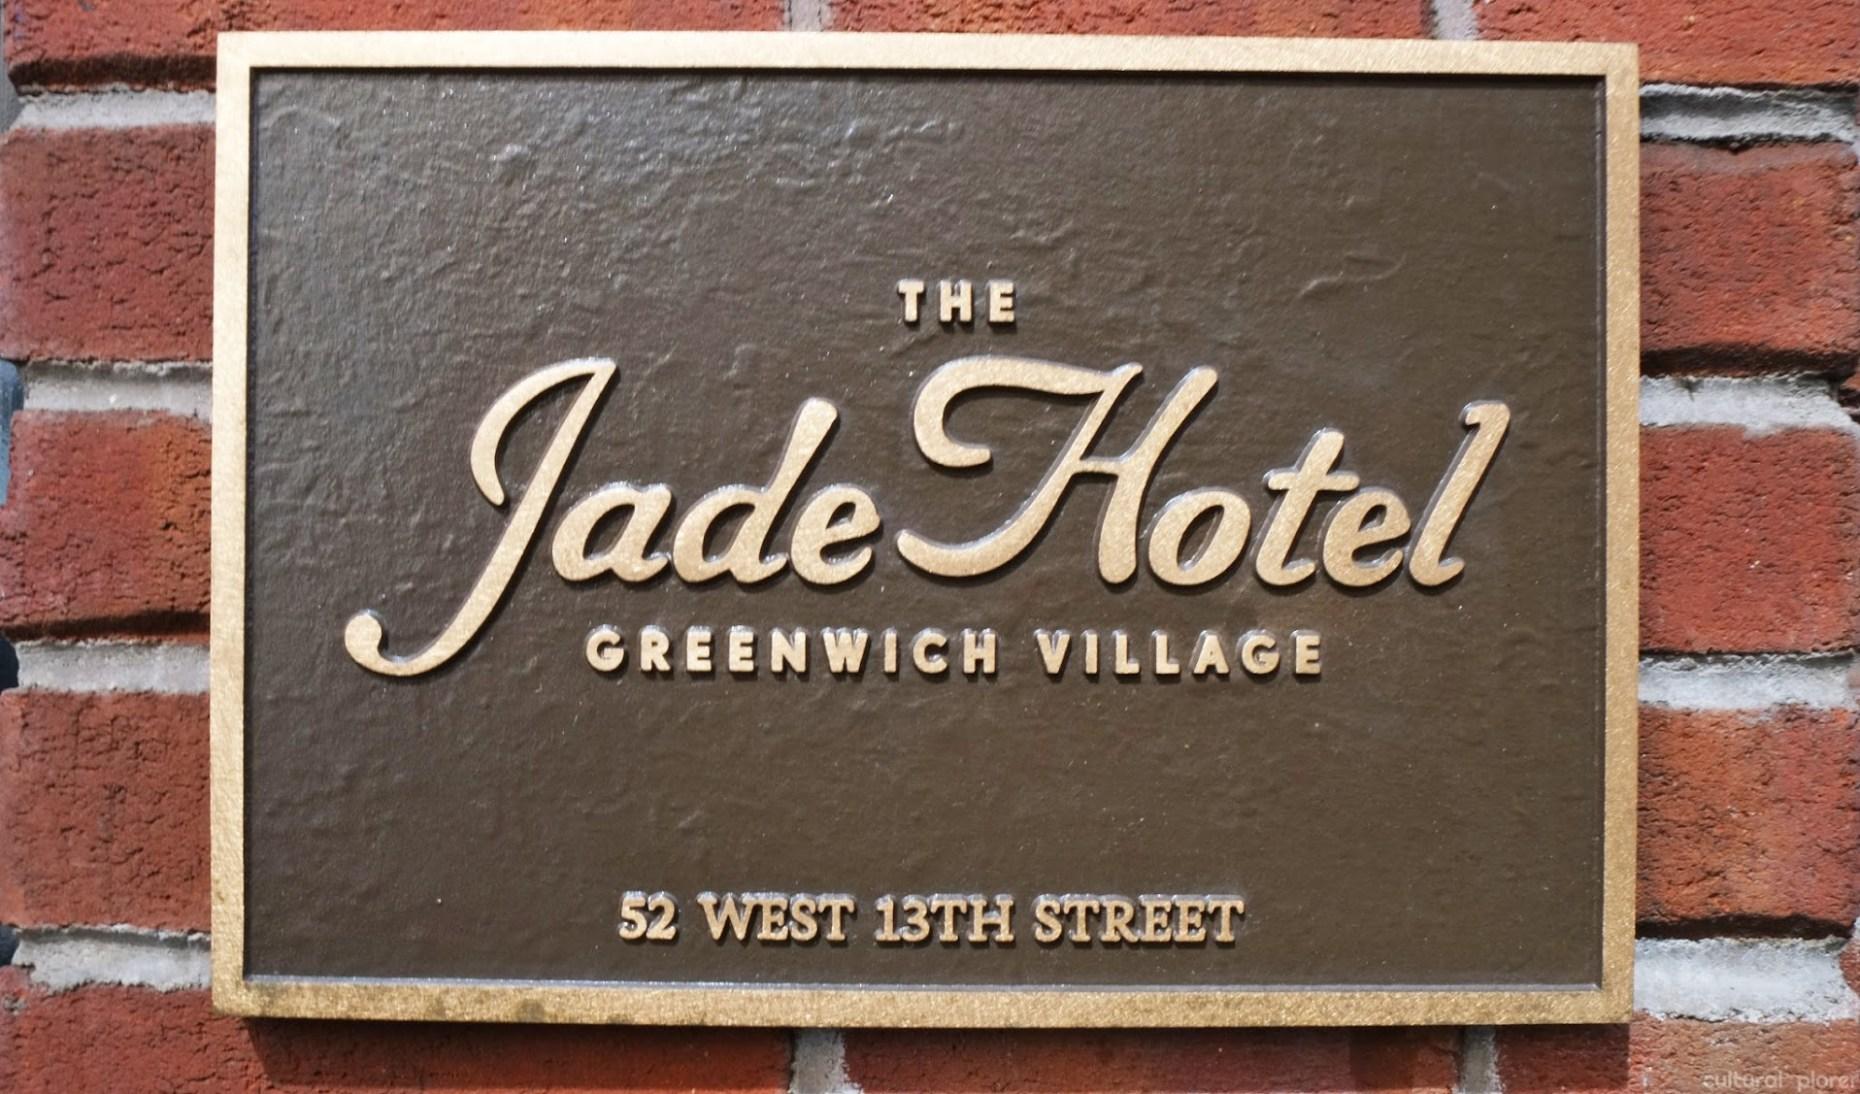 The Jade Hotel